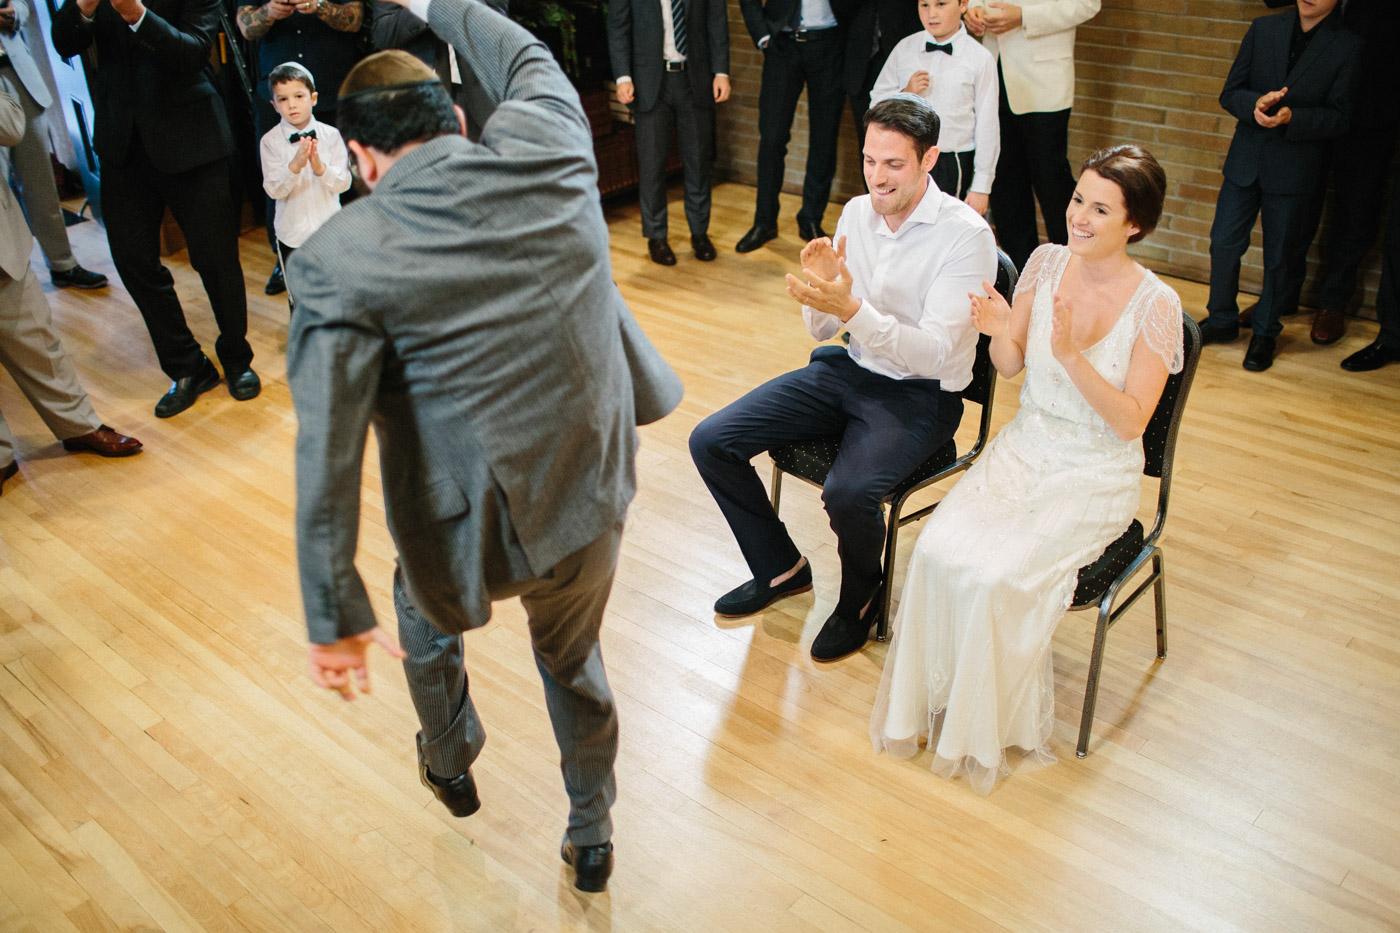 toronto_wedding_photographer_the_great_hall-70.jpg